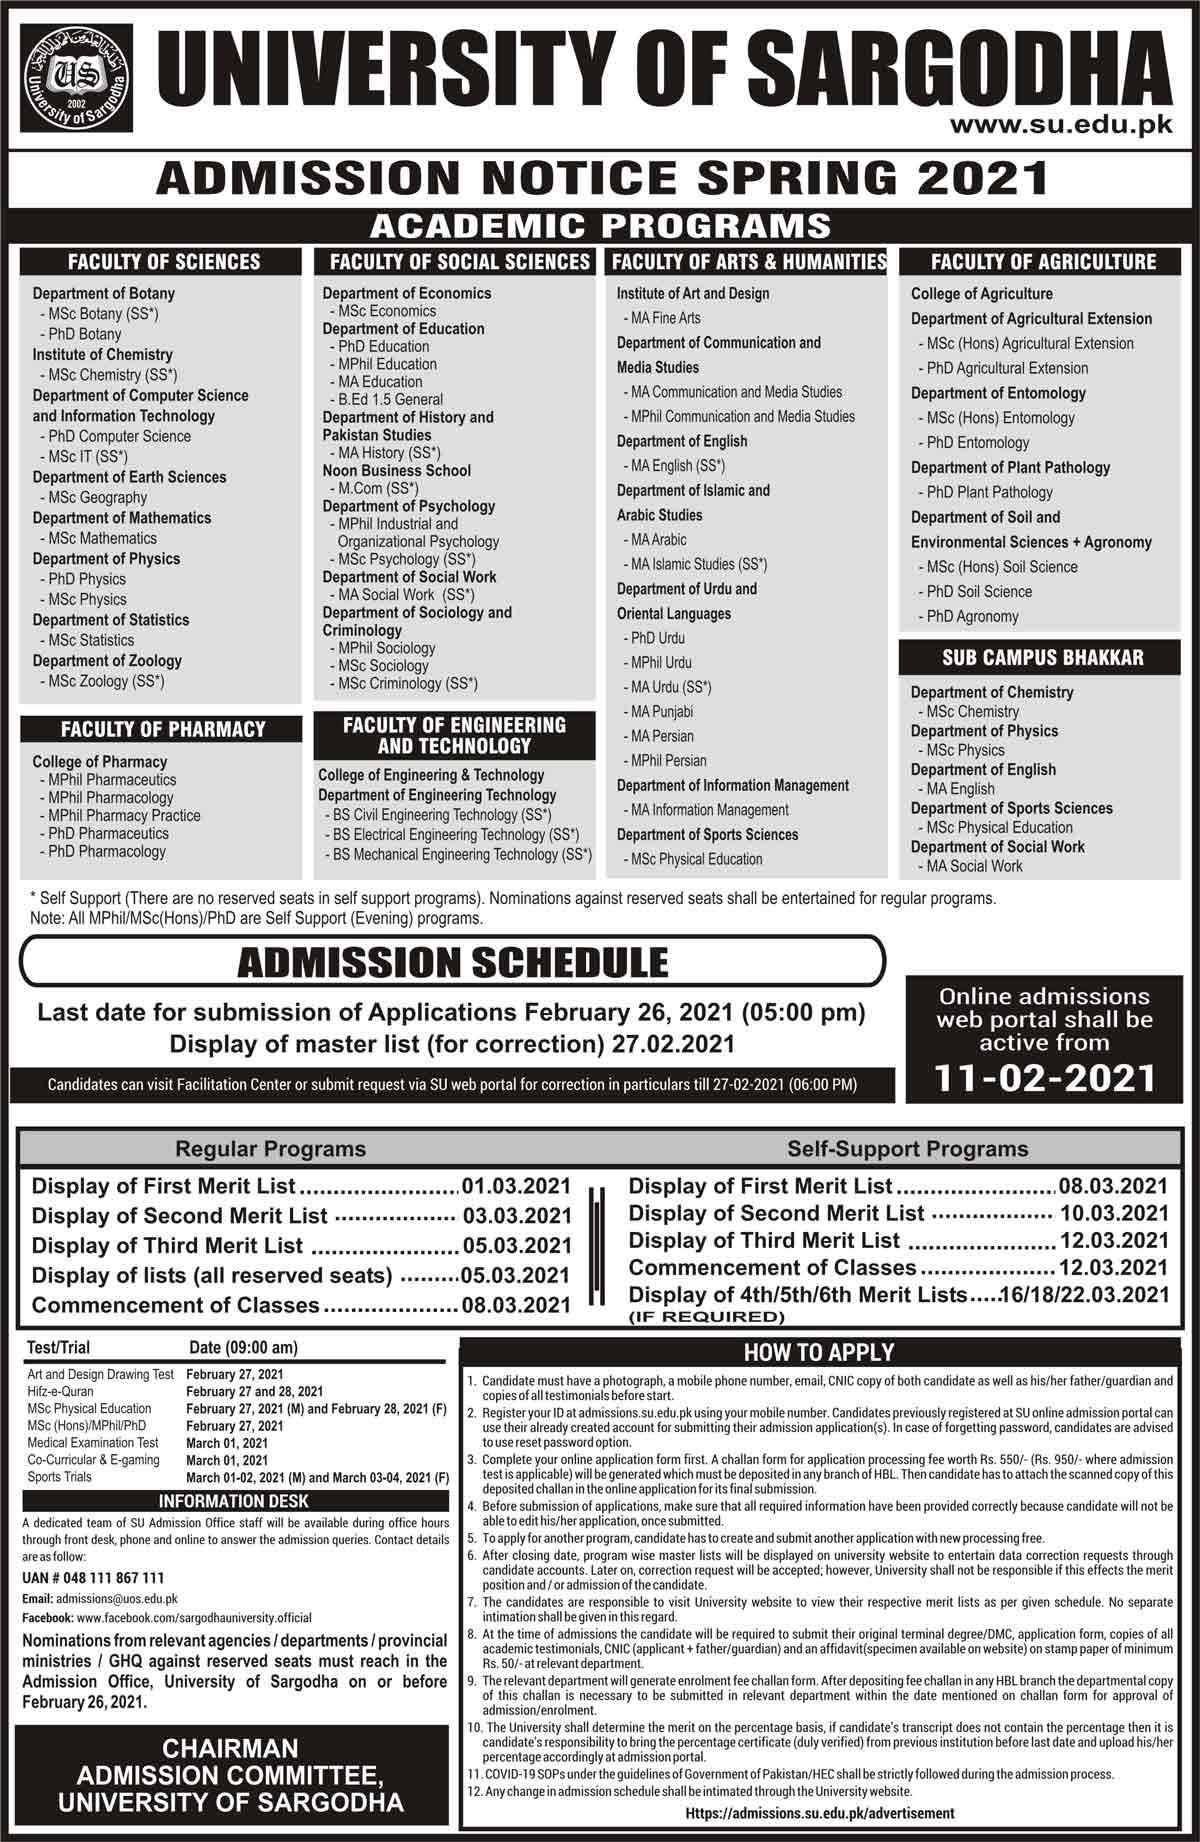 University-of-Sargodha-Admission-Merit-List-2021